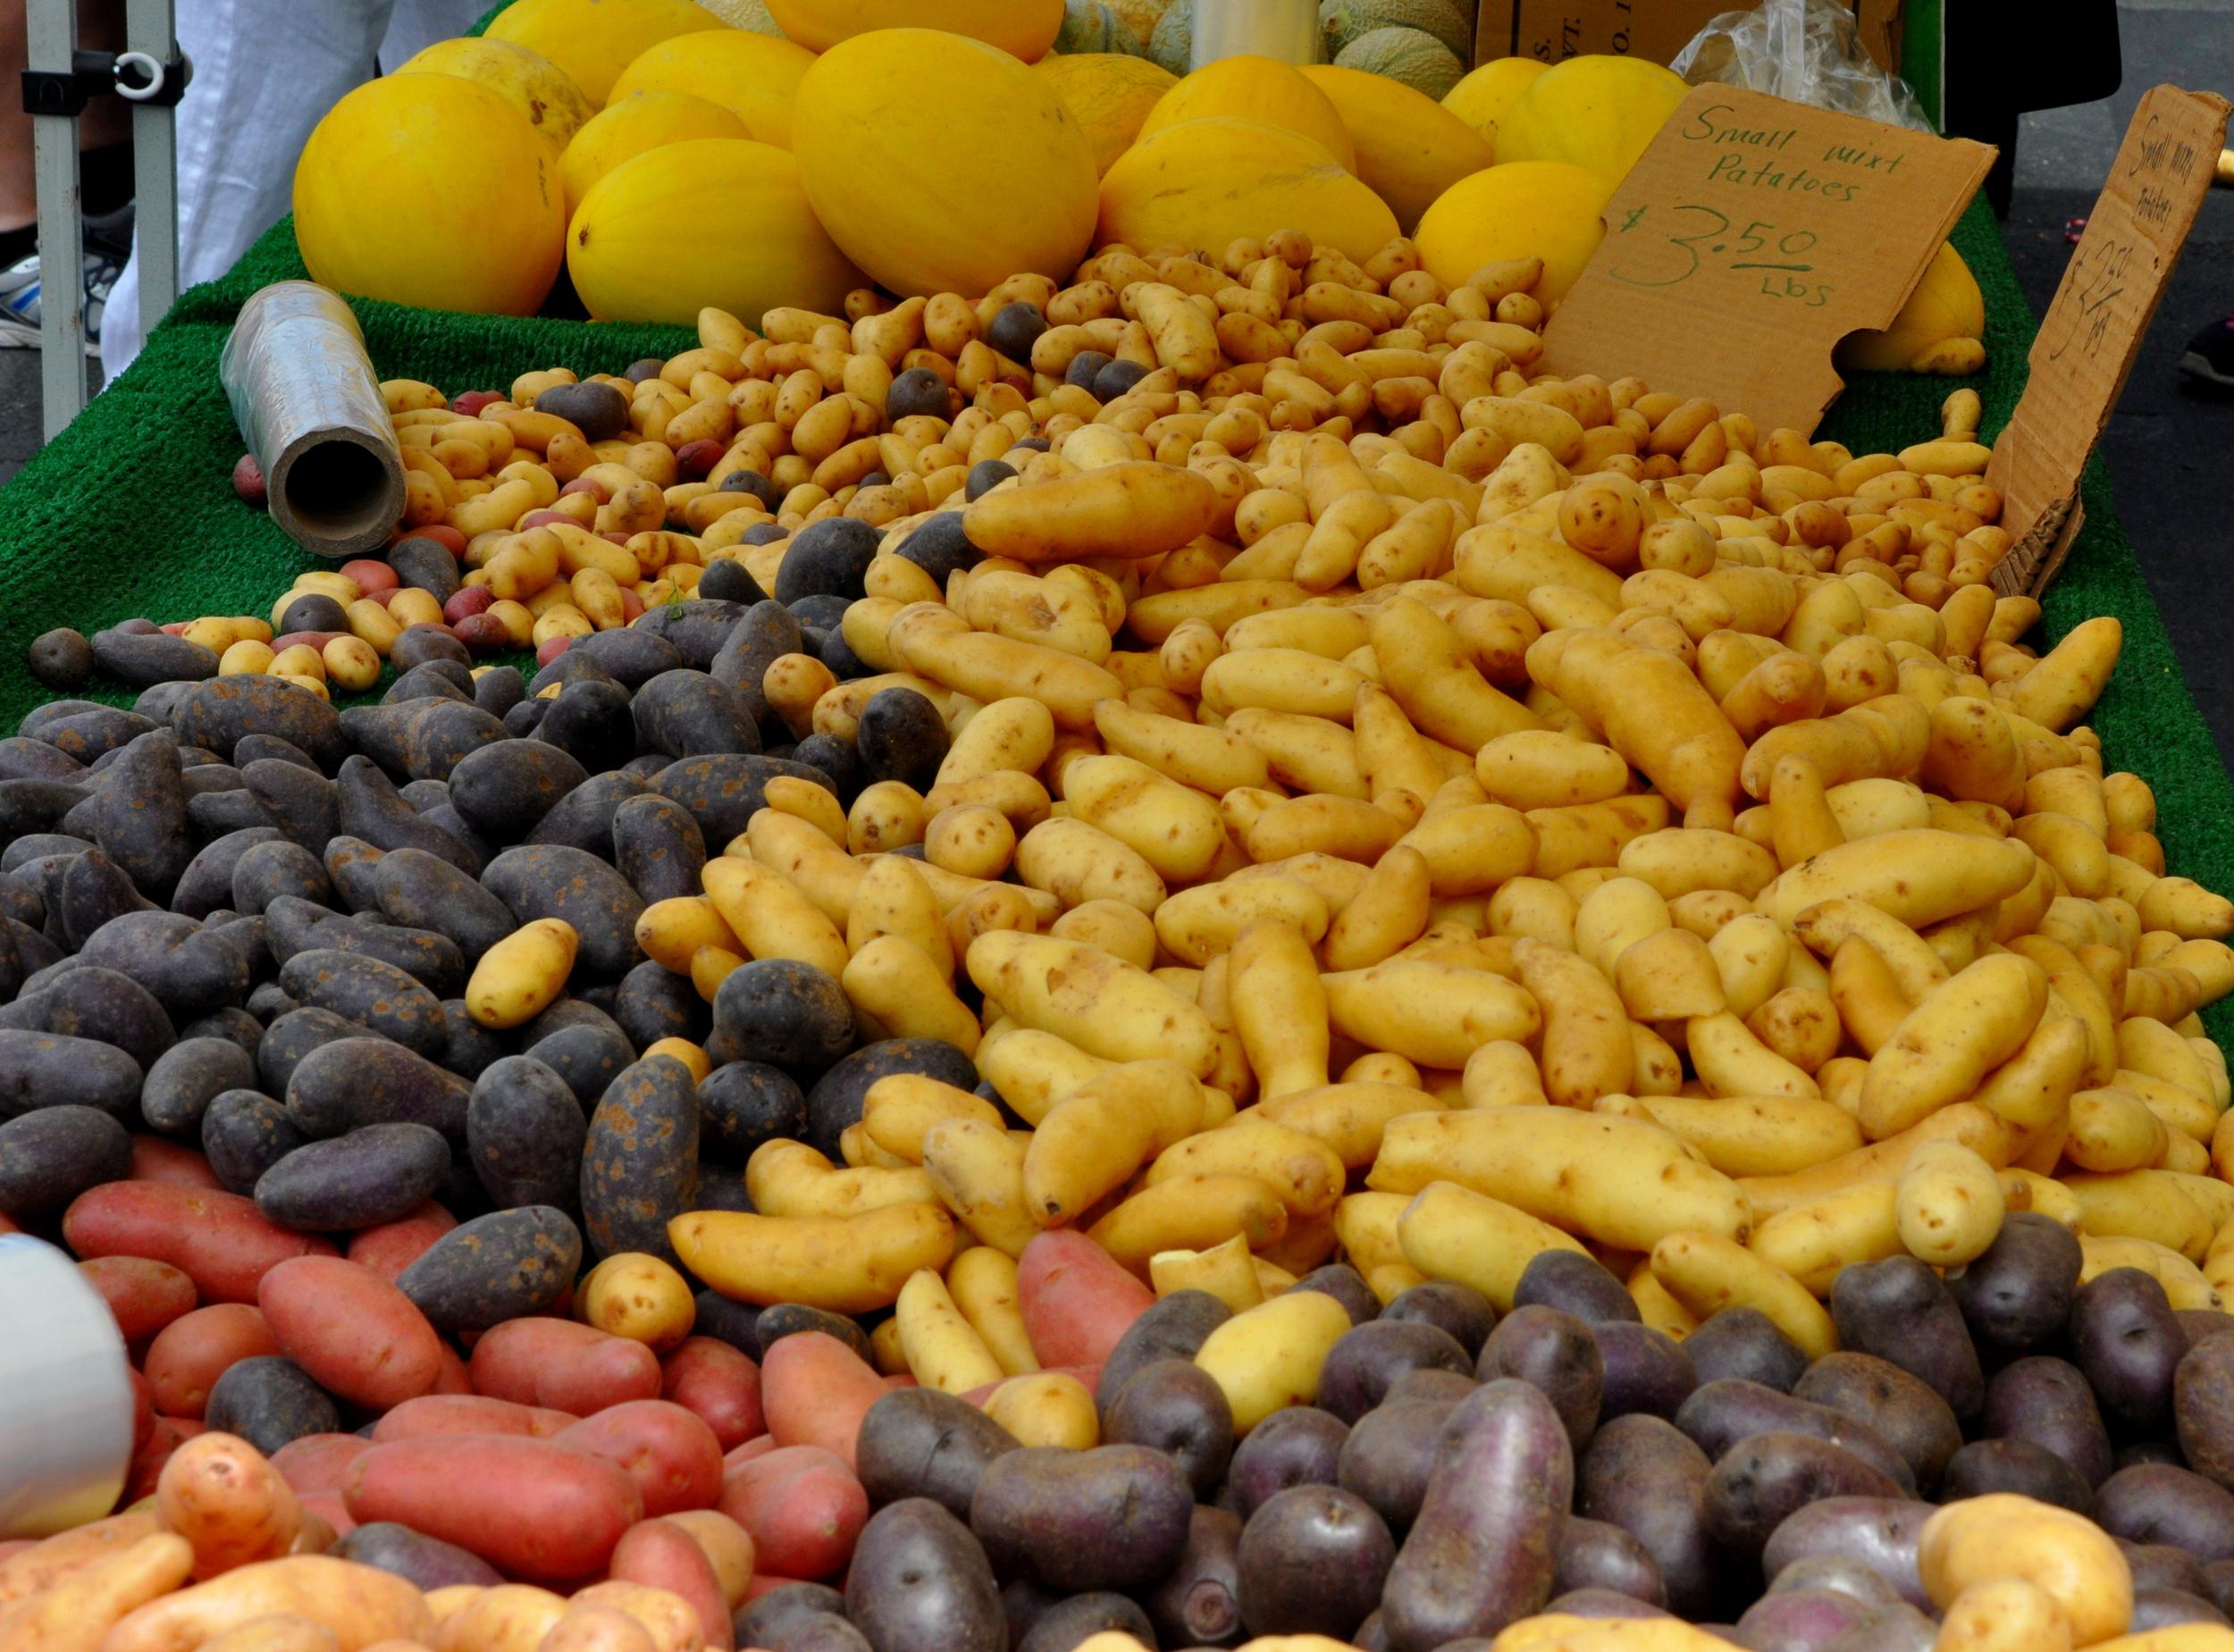 Potatoes at the Hollywood Farmers Market  ©Copyright 2015 Bridget Barnes